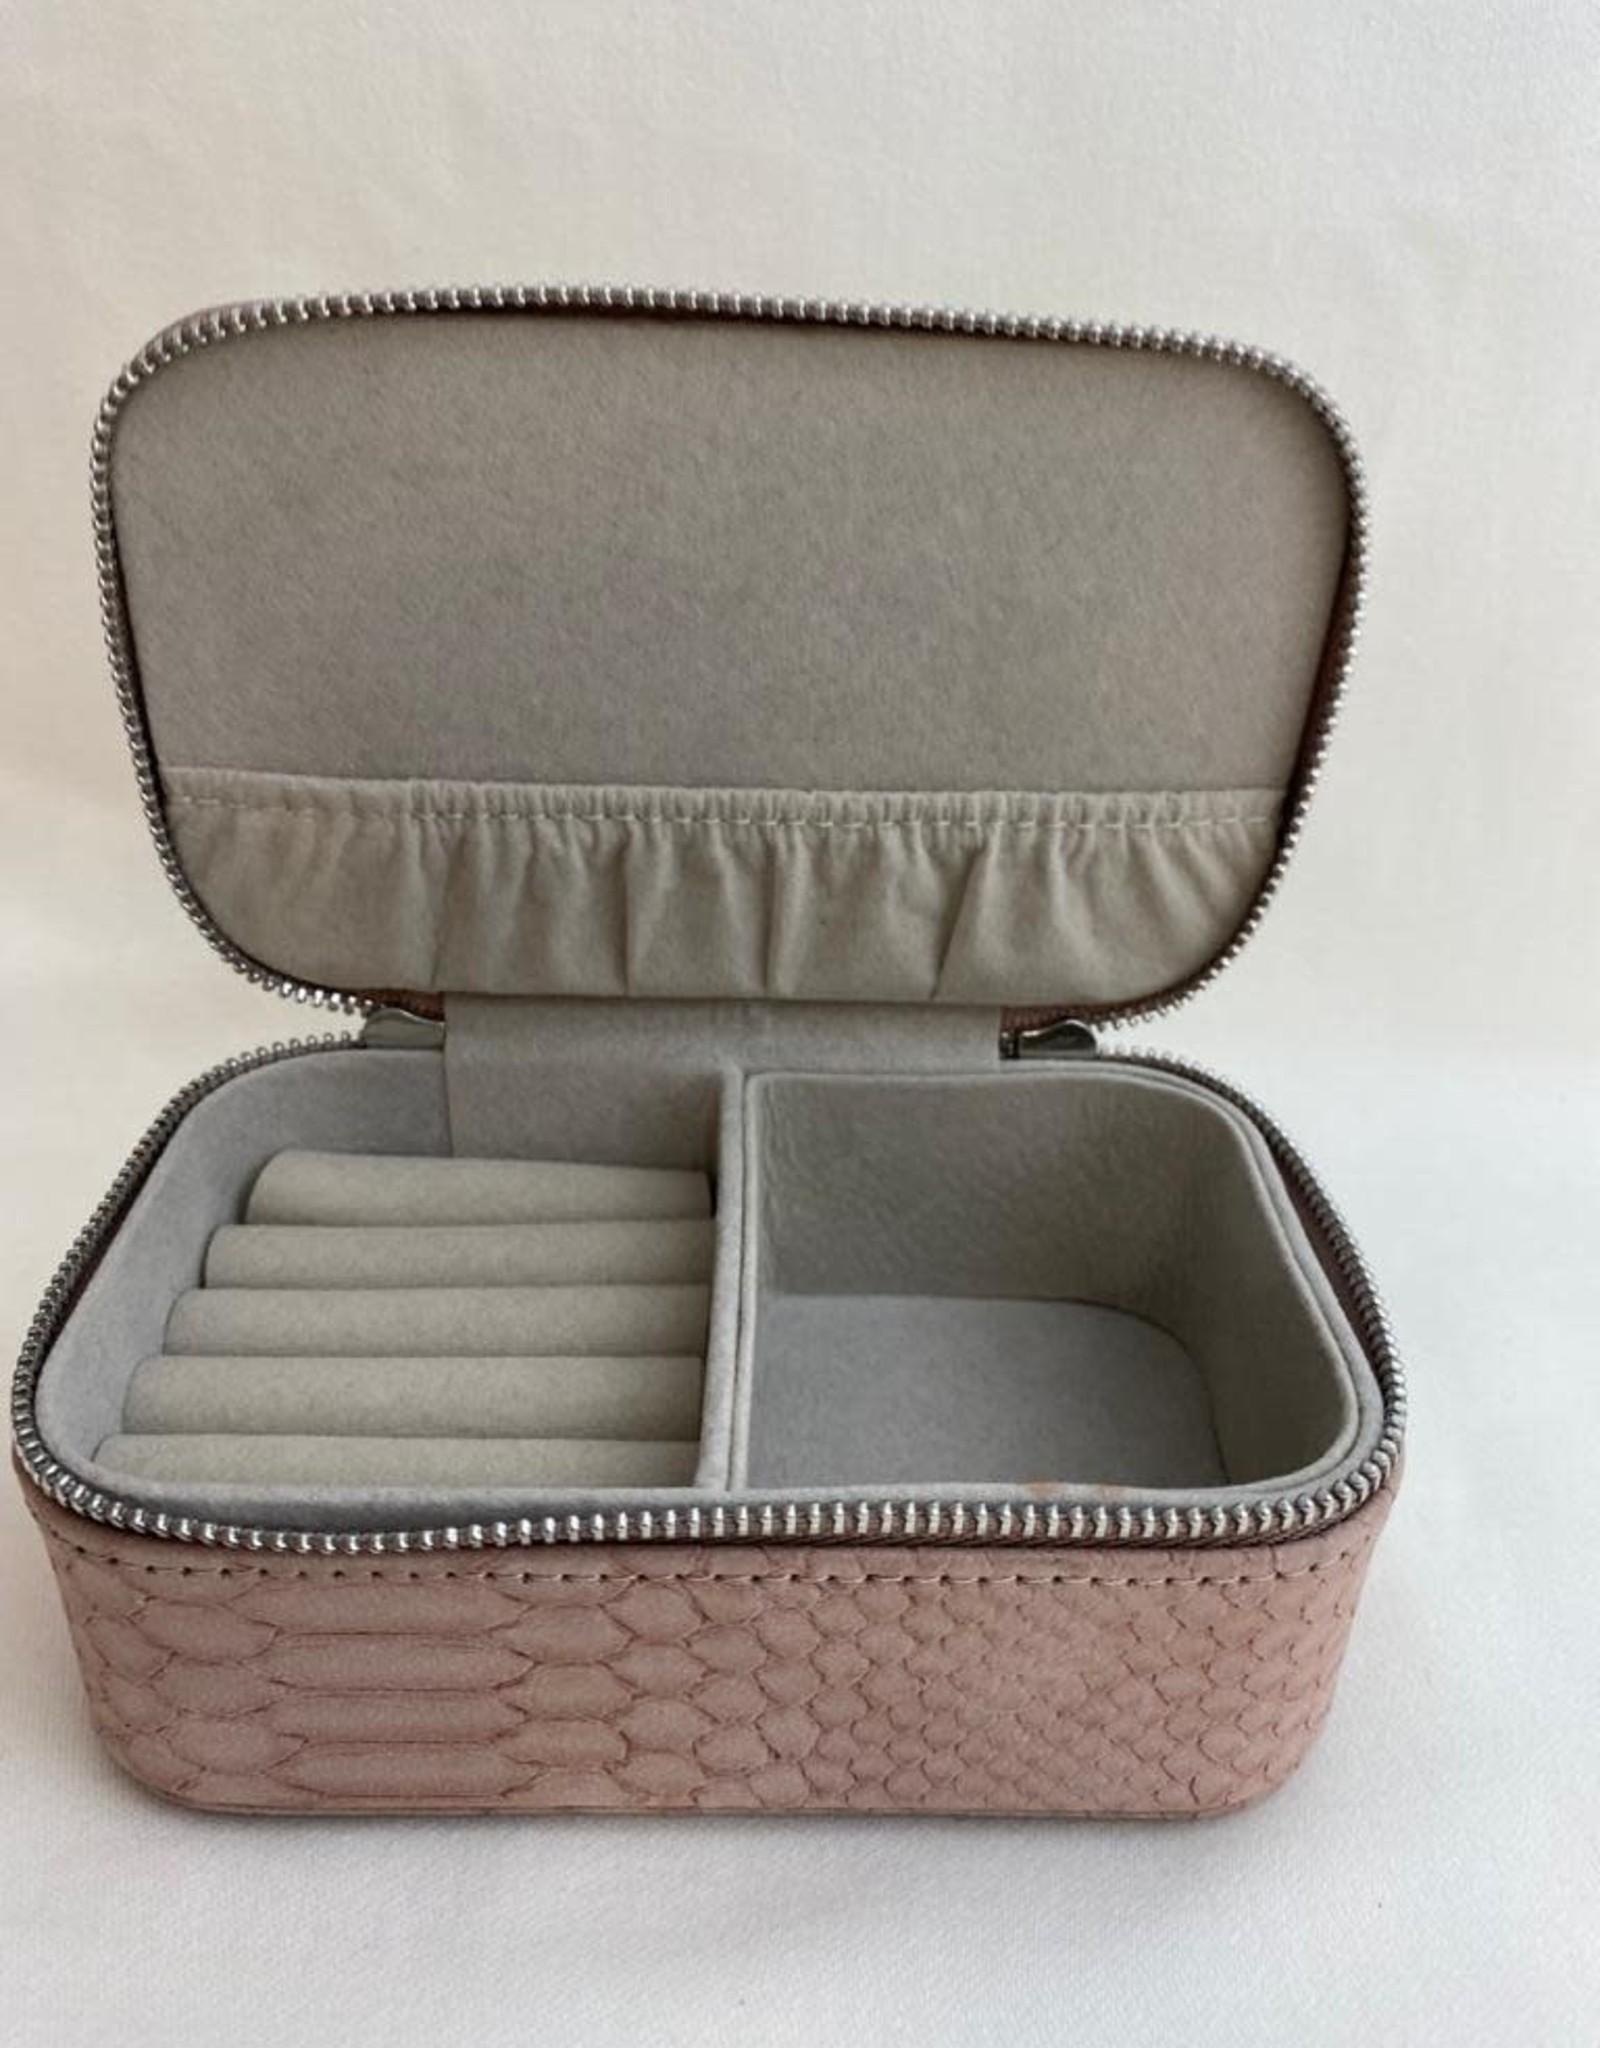 ESTELLA BARTLETT JEWELLERY BOX /  TRAVEL CASE BY ESTELLA BARTLETT